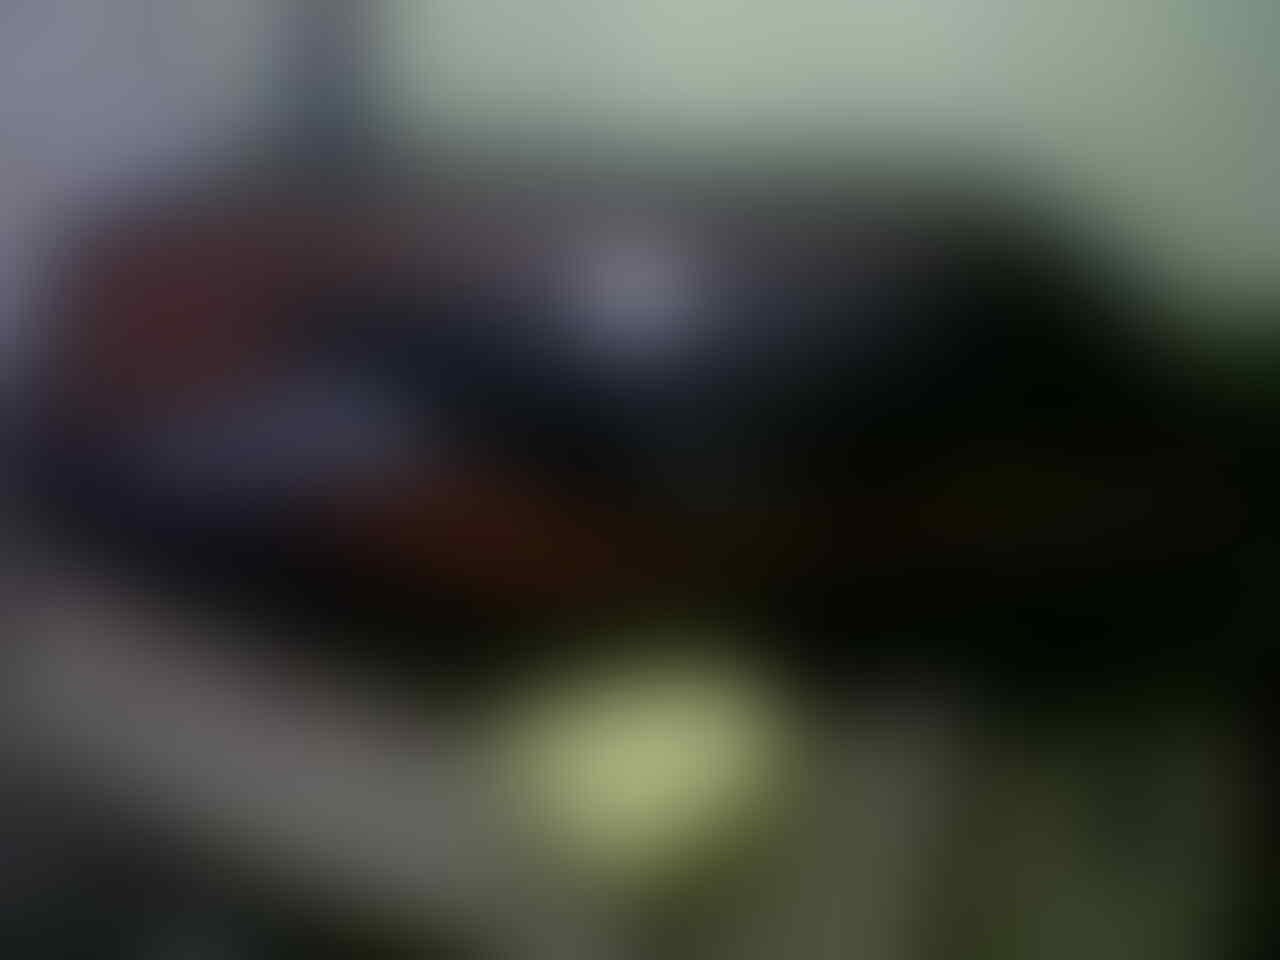 TANGKI BENSIN RX KING BELI ECER HARGA GROSIR BRO !!